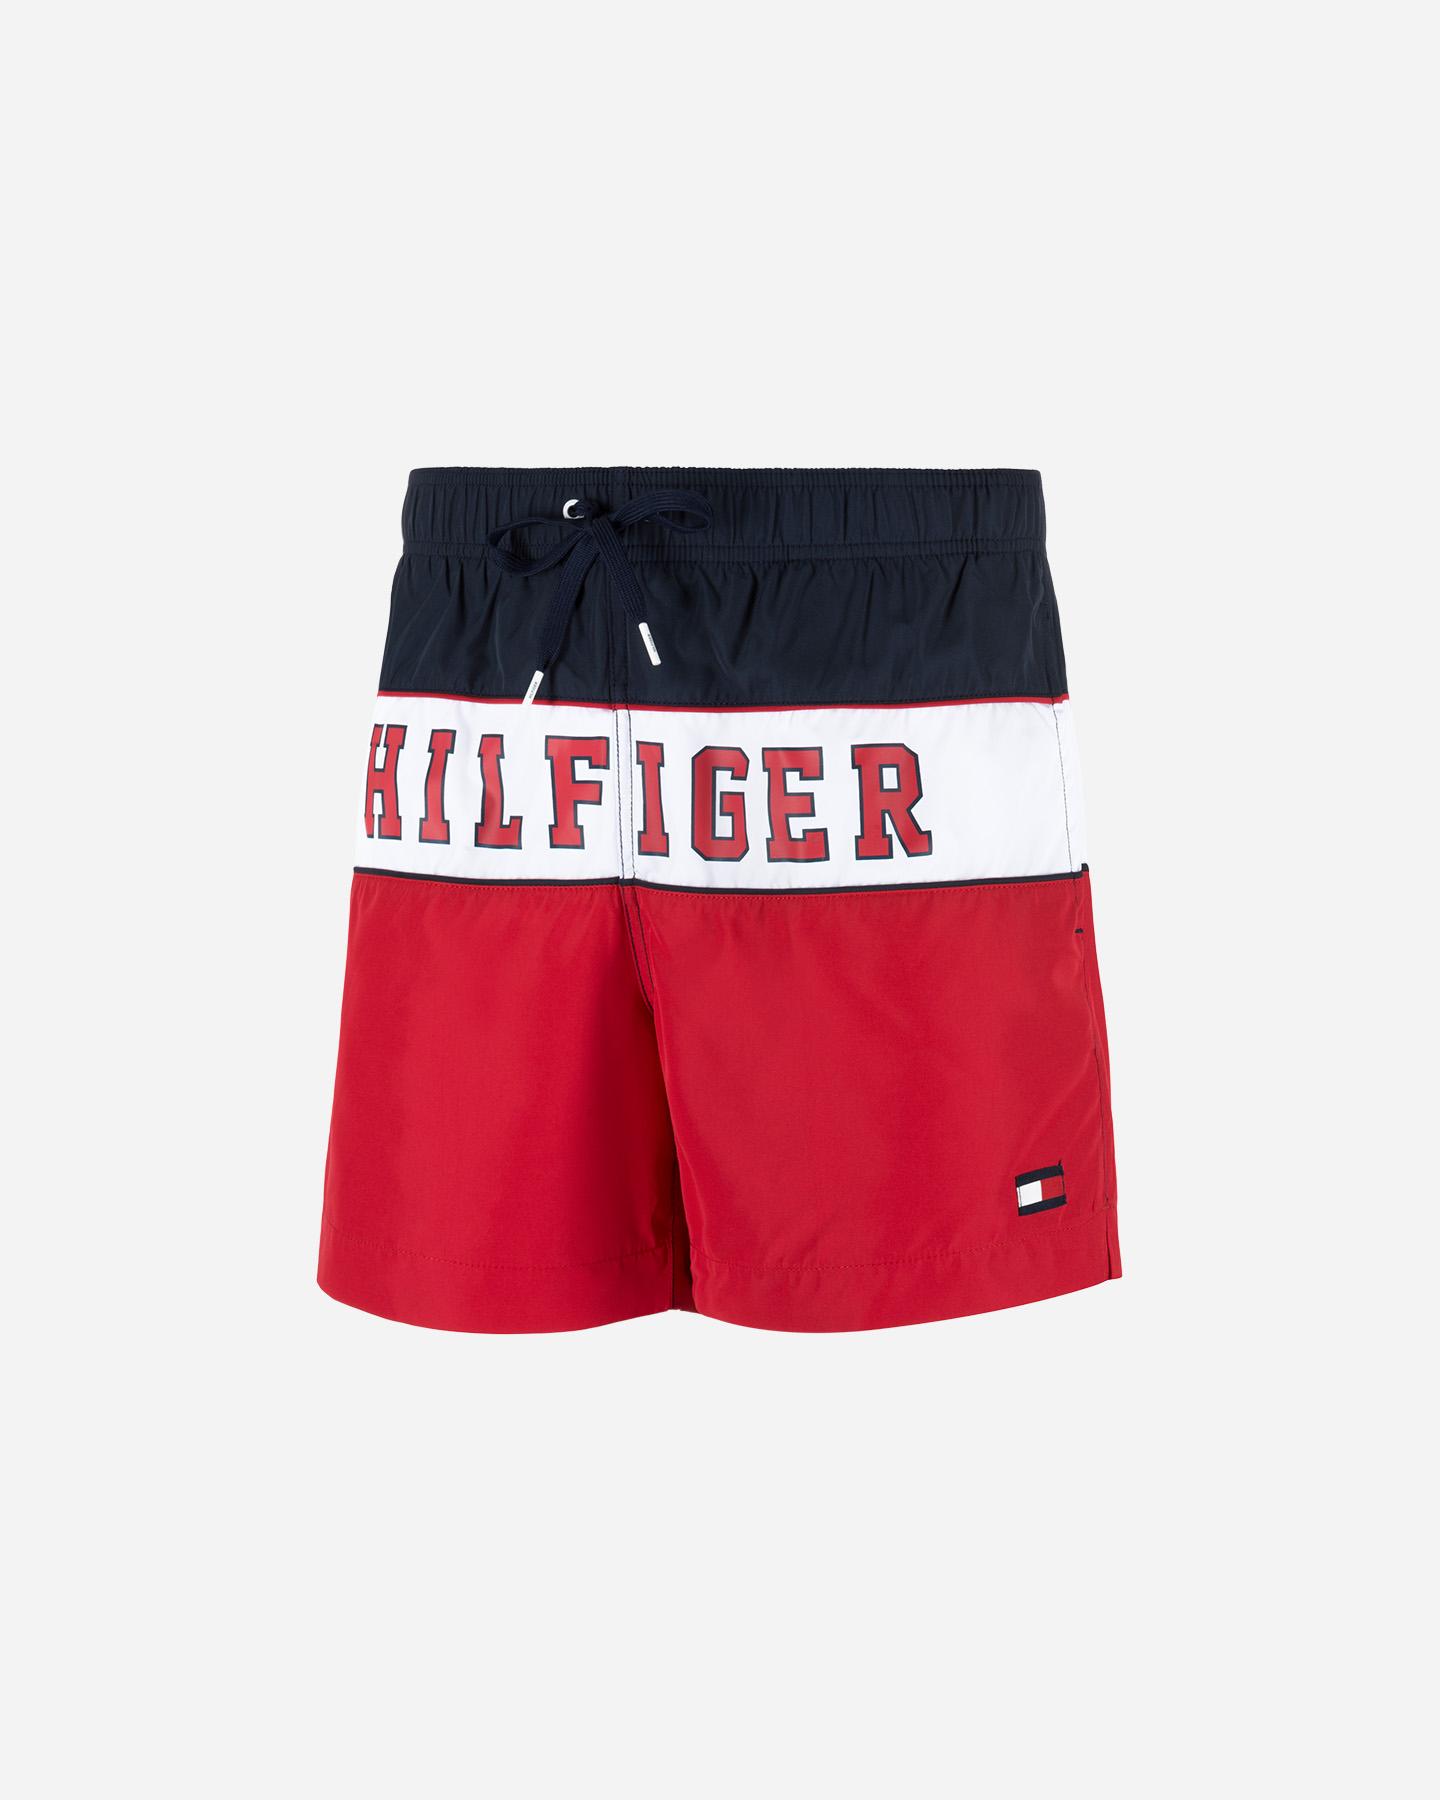 2a2112b381f7 Boxer Mare Tommy Hilfiger Color Block M UM0UM01116611 | Cisalfa Sport